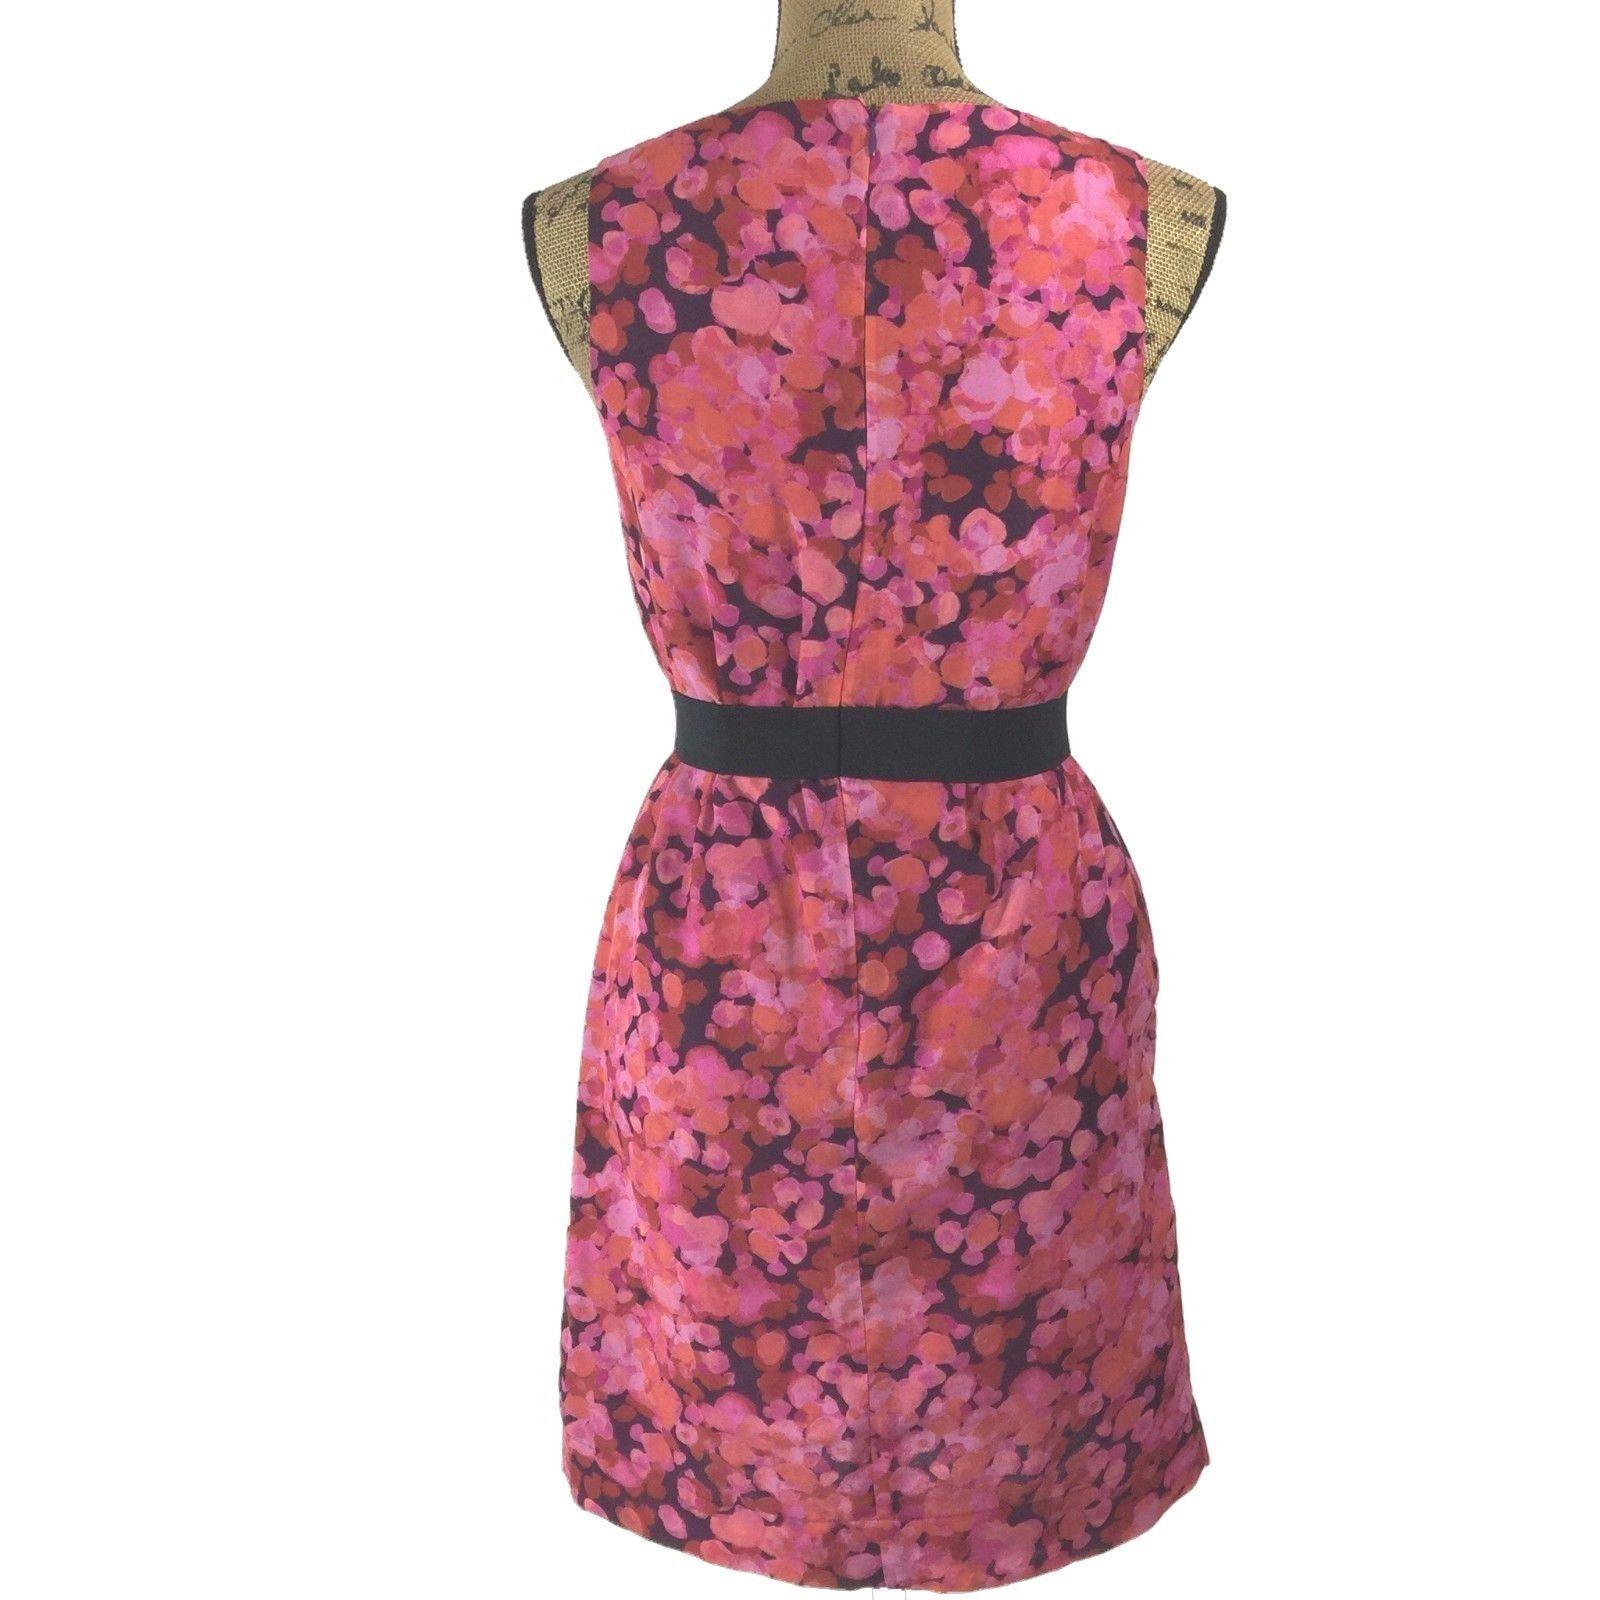 SET Ann Taylor LOFT Dress J.Crew Clare Cardigan Sweater Pink Purple Black 2 S LN image 8